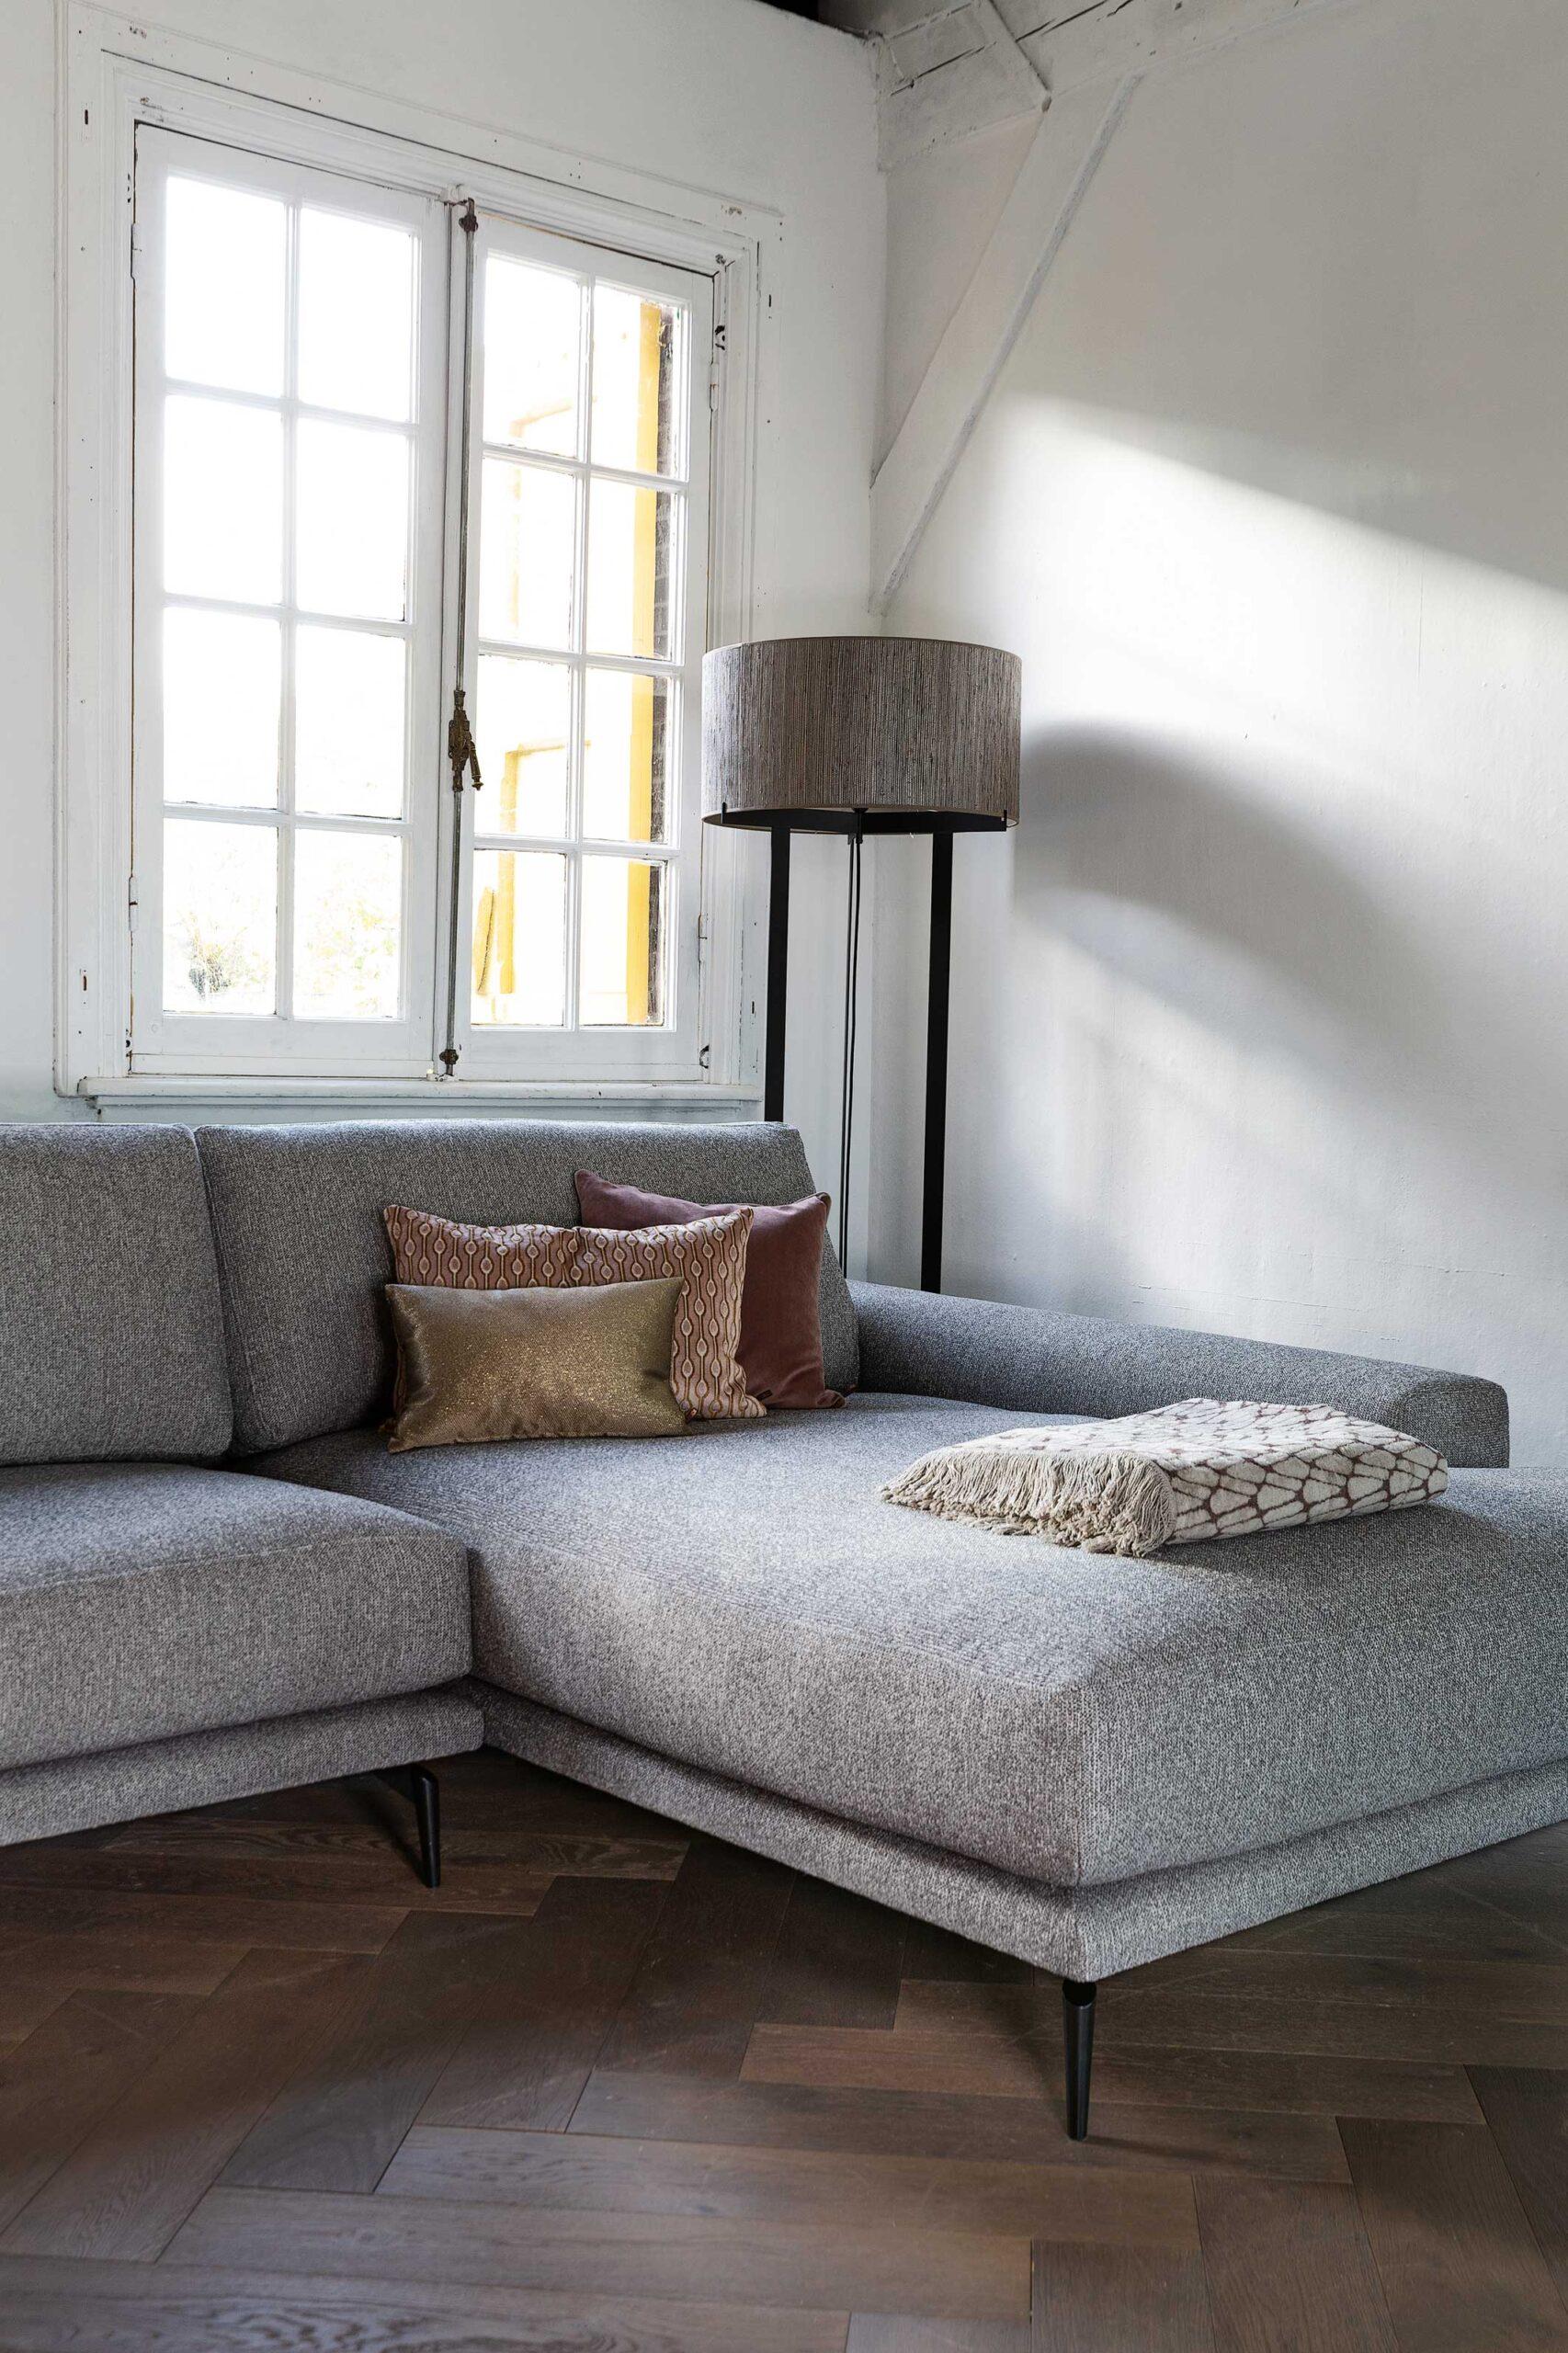 belle-milano-hoekbank-detailfoto-breede-longchair-soofs-interieur